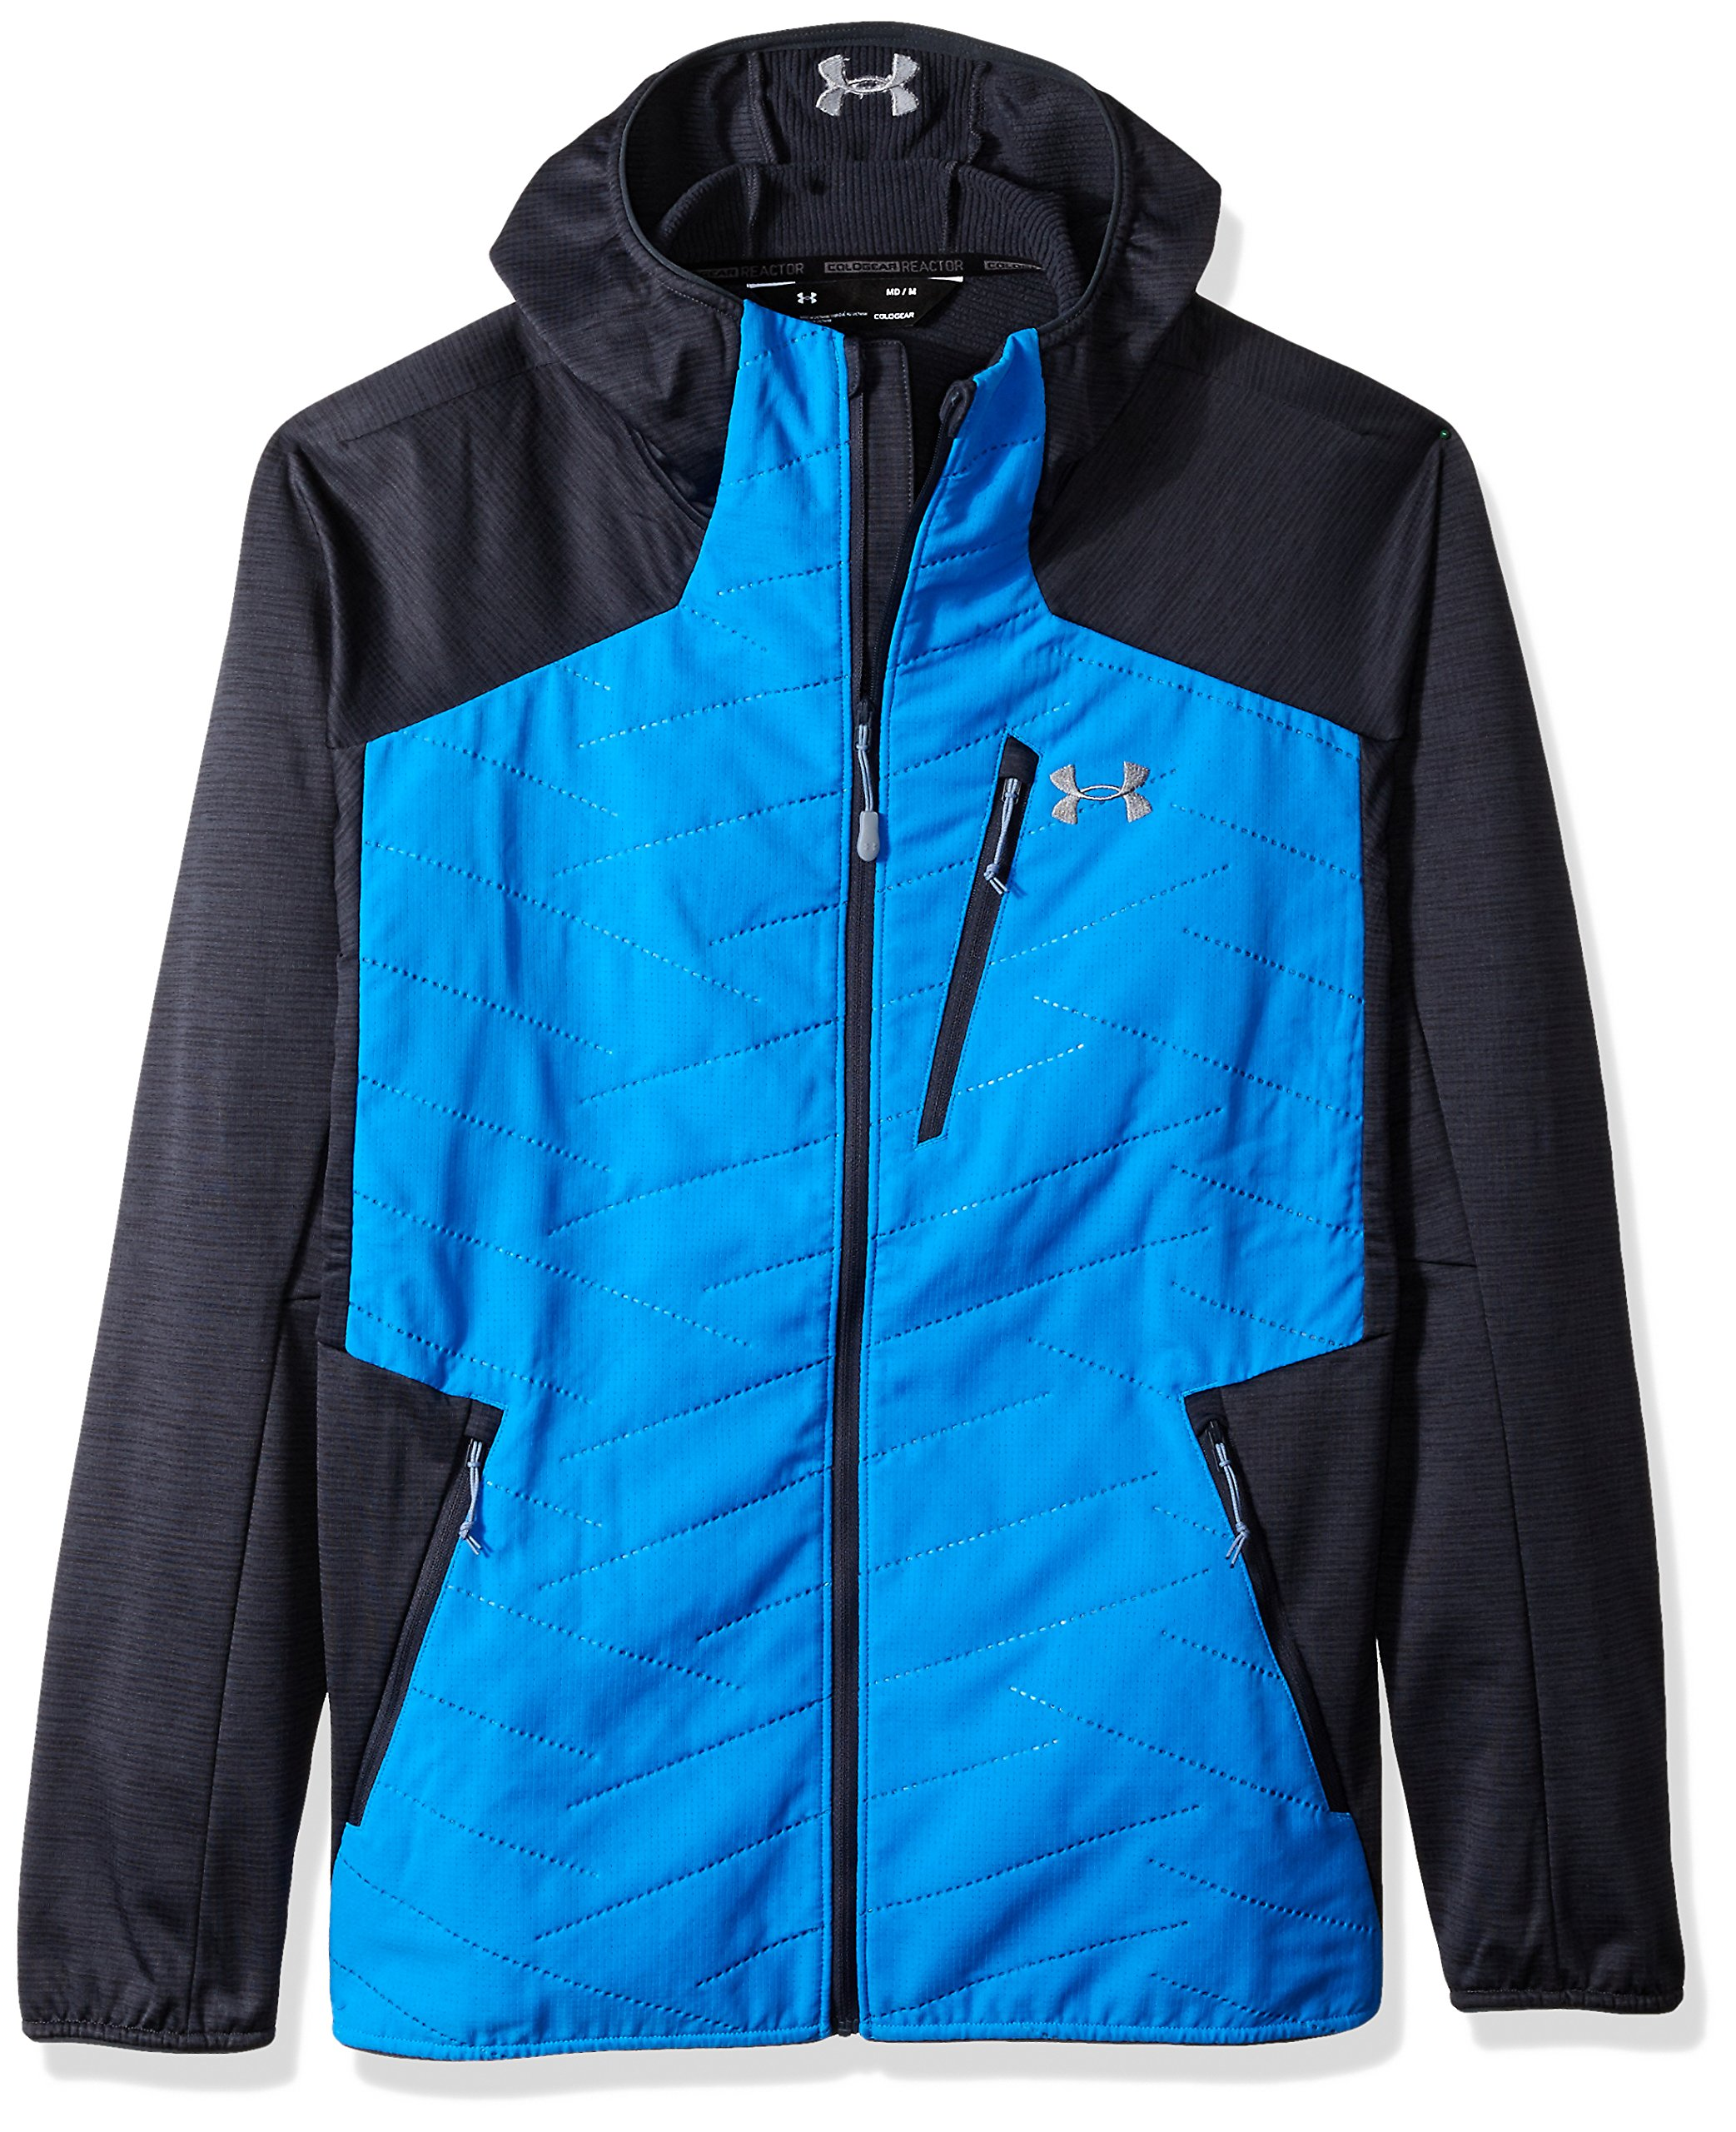 Under Armour Outerwear Under Armour Men's Reactor 3G Jacket, Mako Blue/Steel, Small